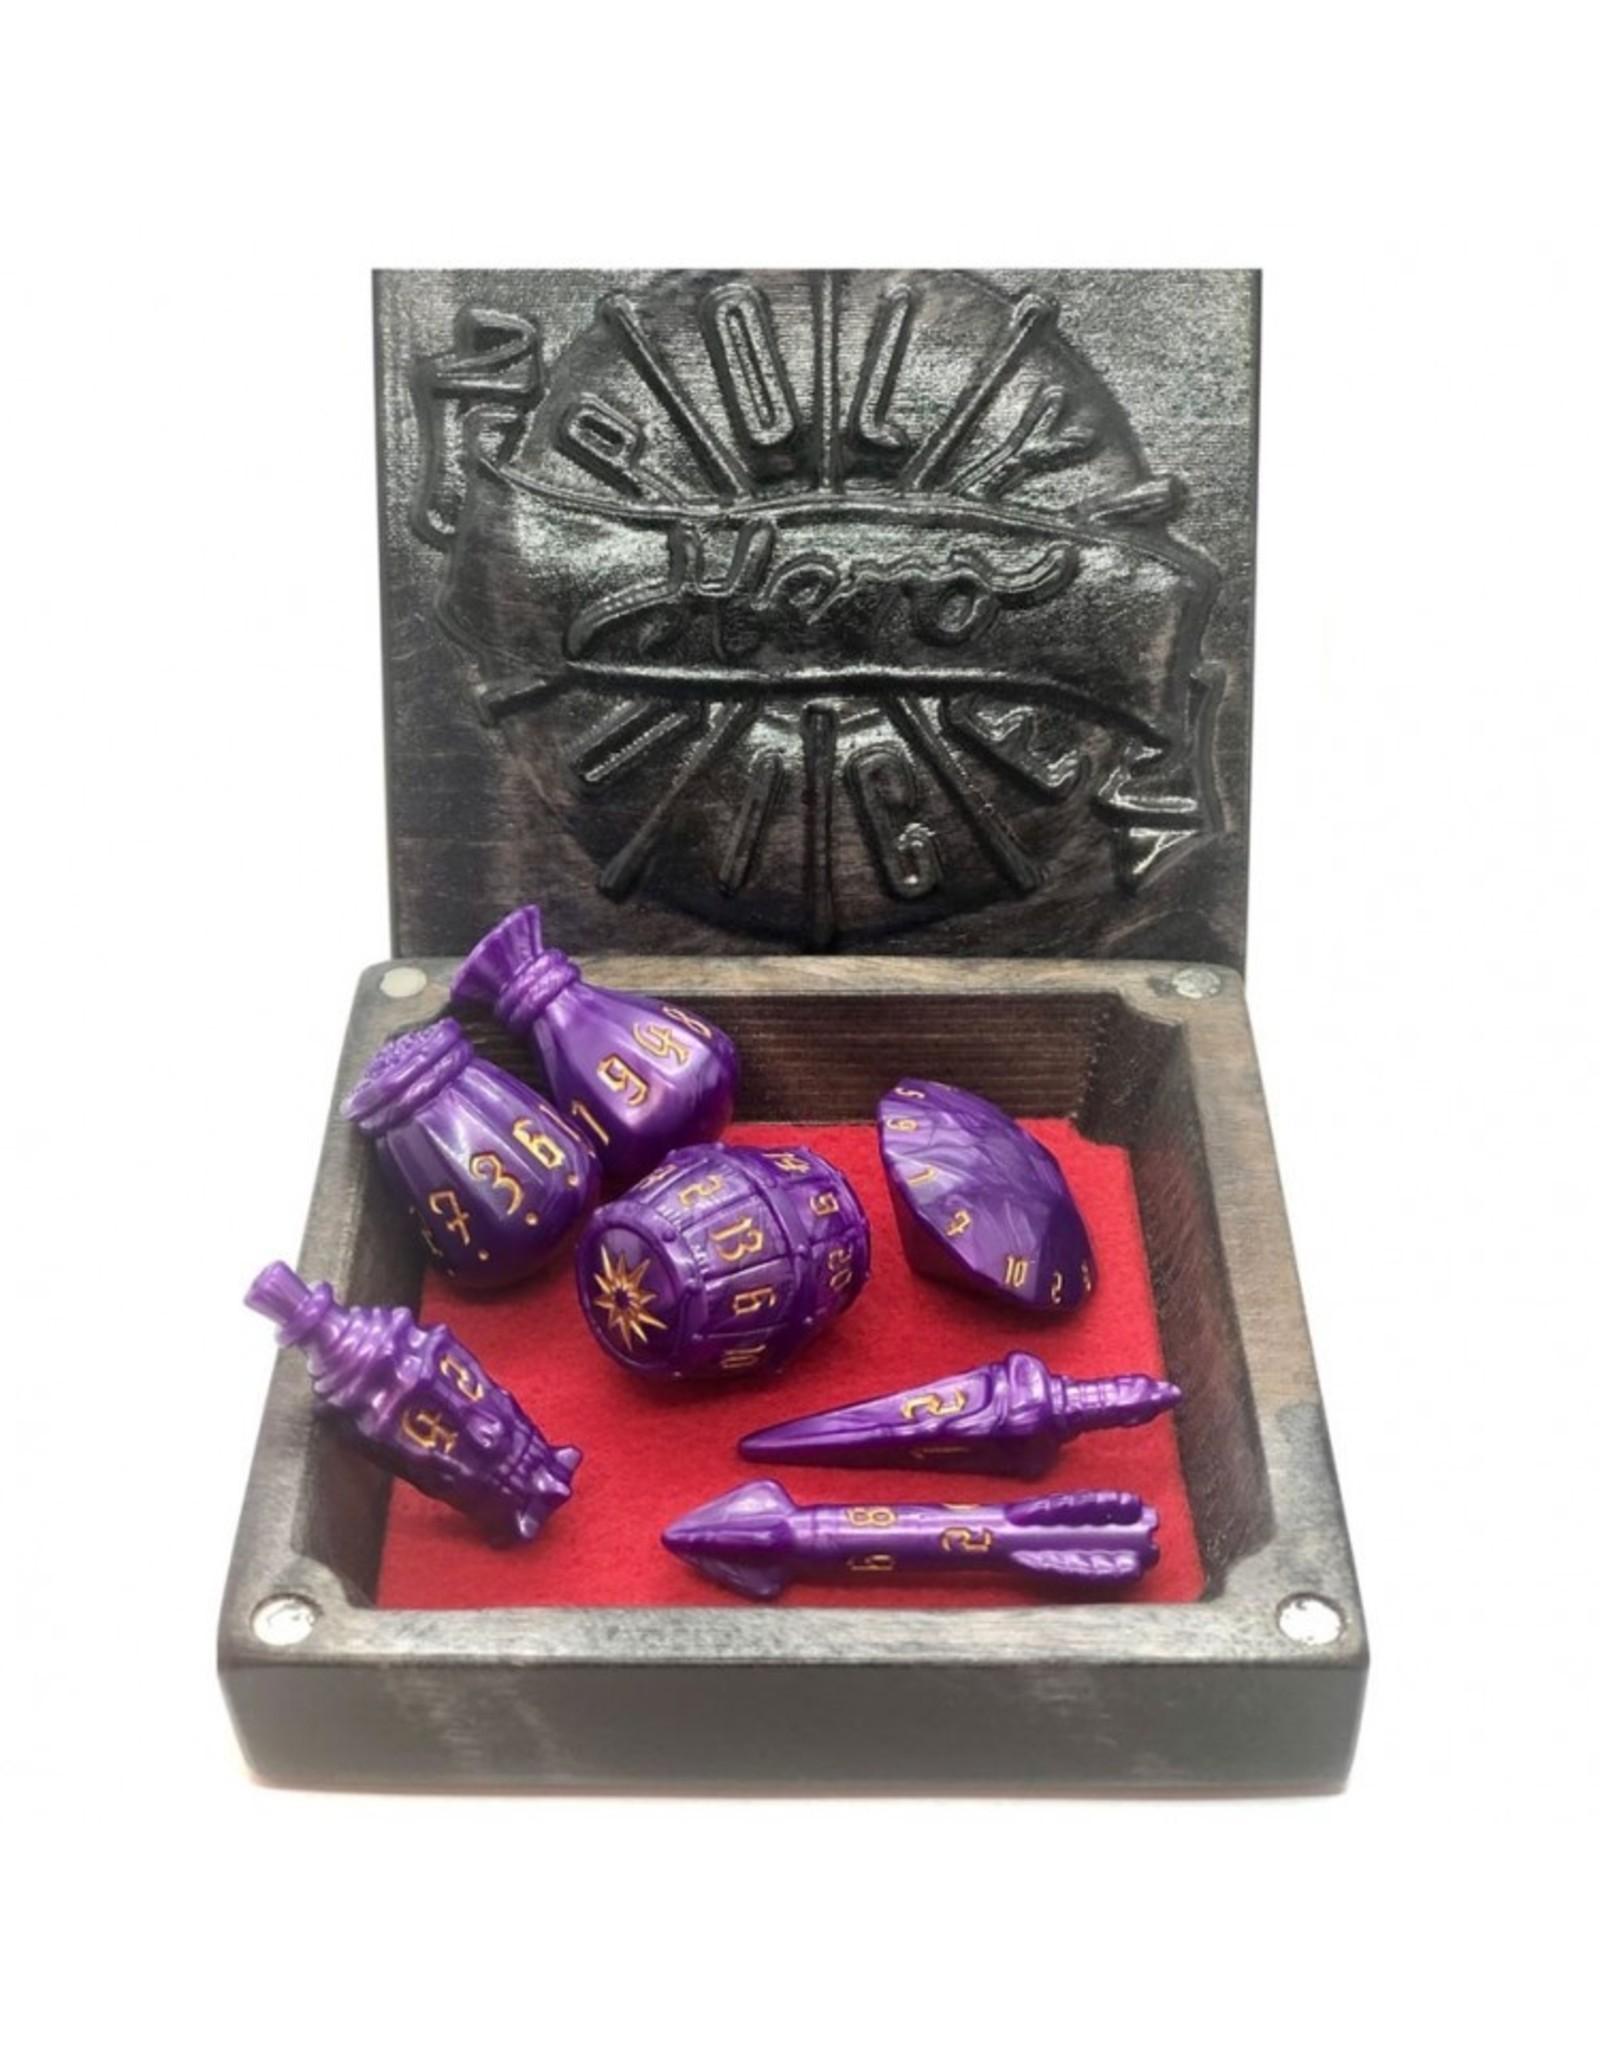 Dice: Rogue: Palace Purple